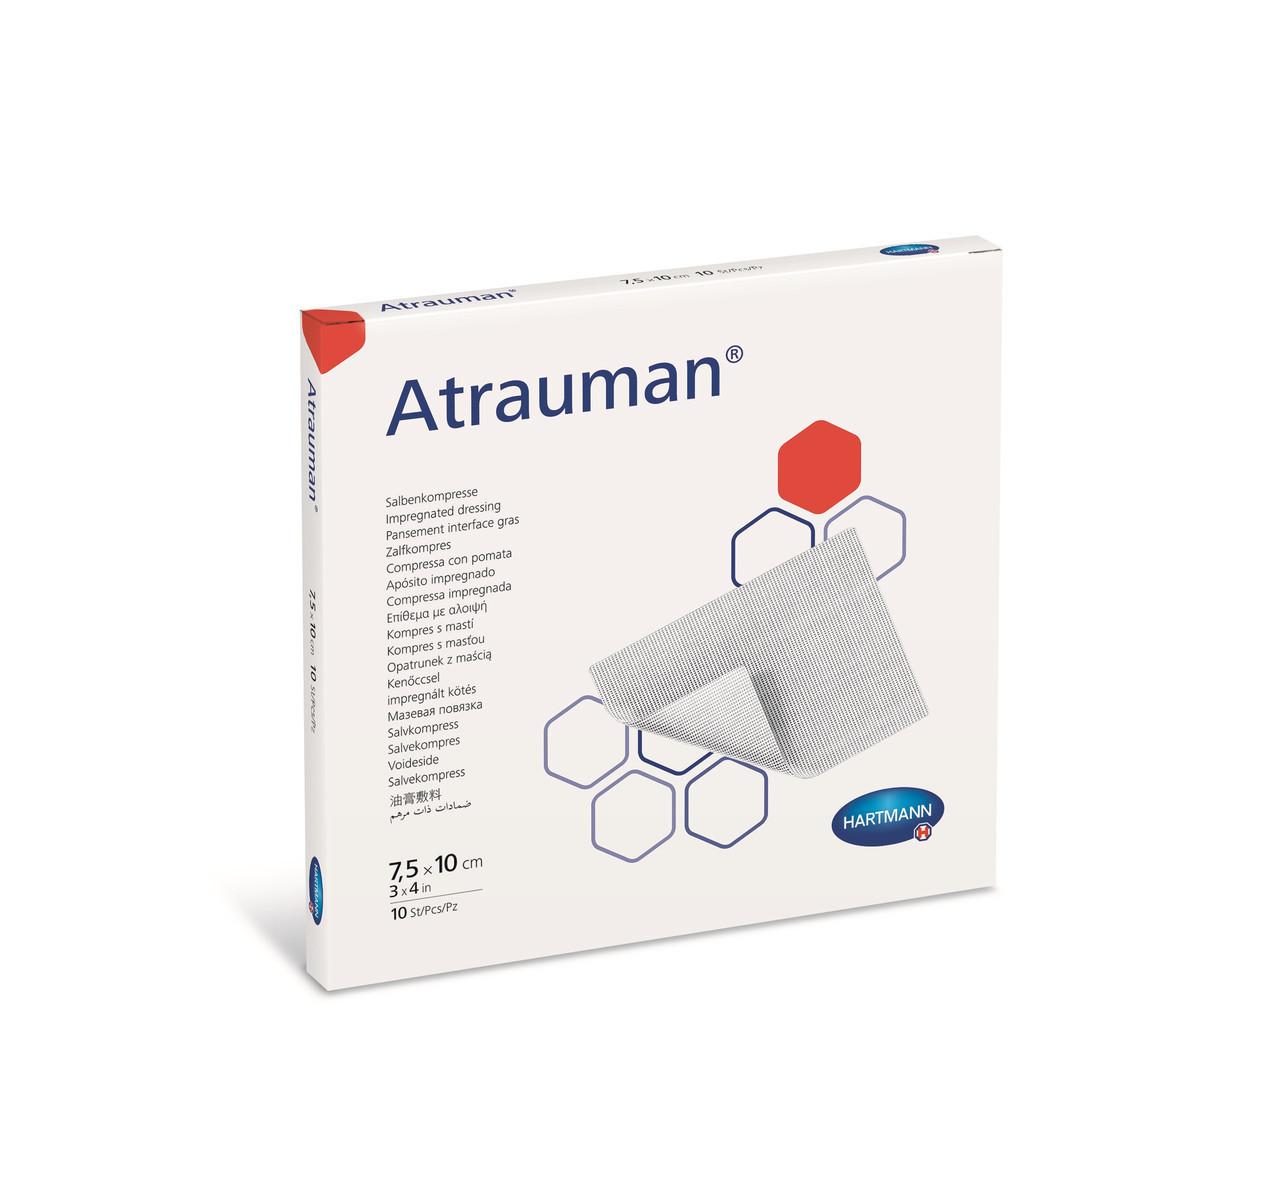 Atrauman / Атрауман мазевая повязка, атравматическая, стерильная, 7,5 х 10 см